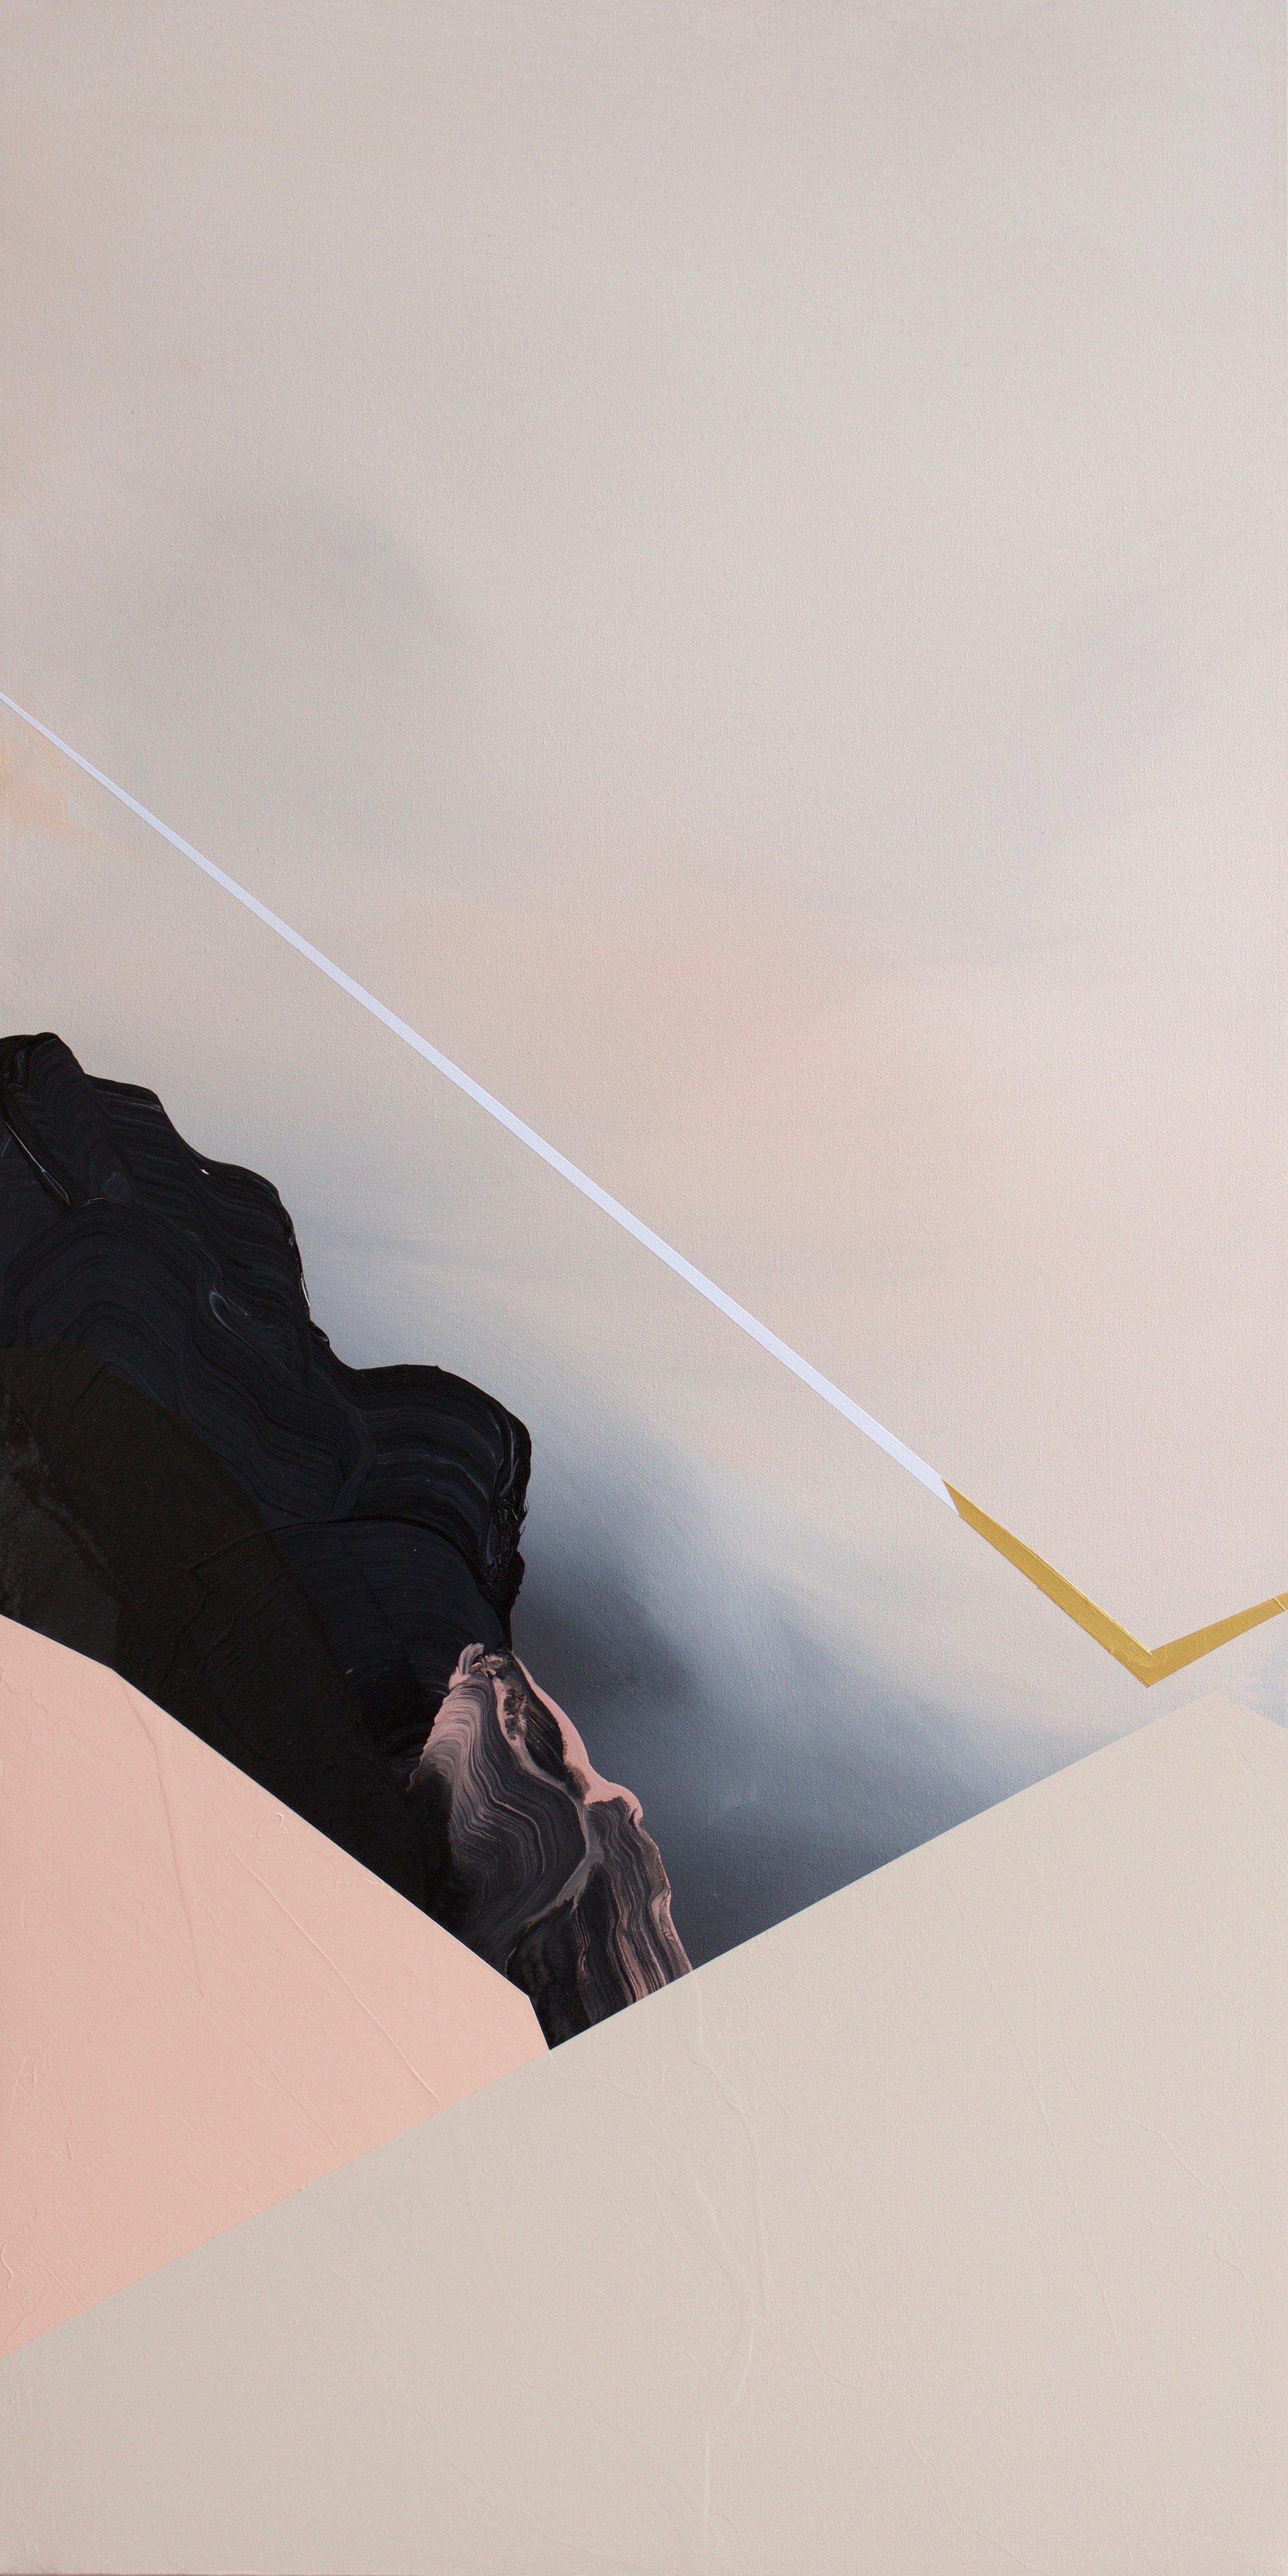 On The Edge  Mixed acrylic medium on canvas 48x24 inches $1050.00